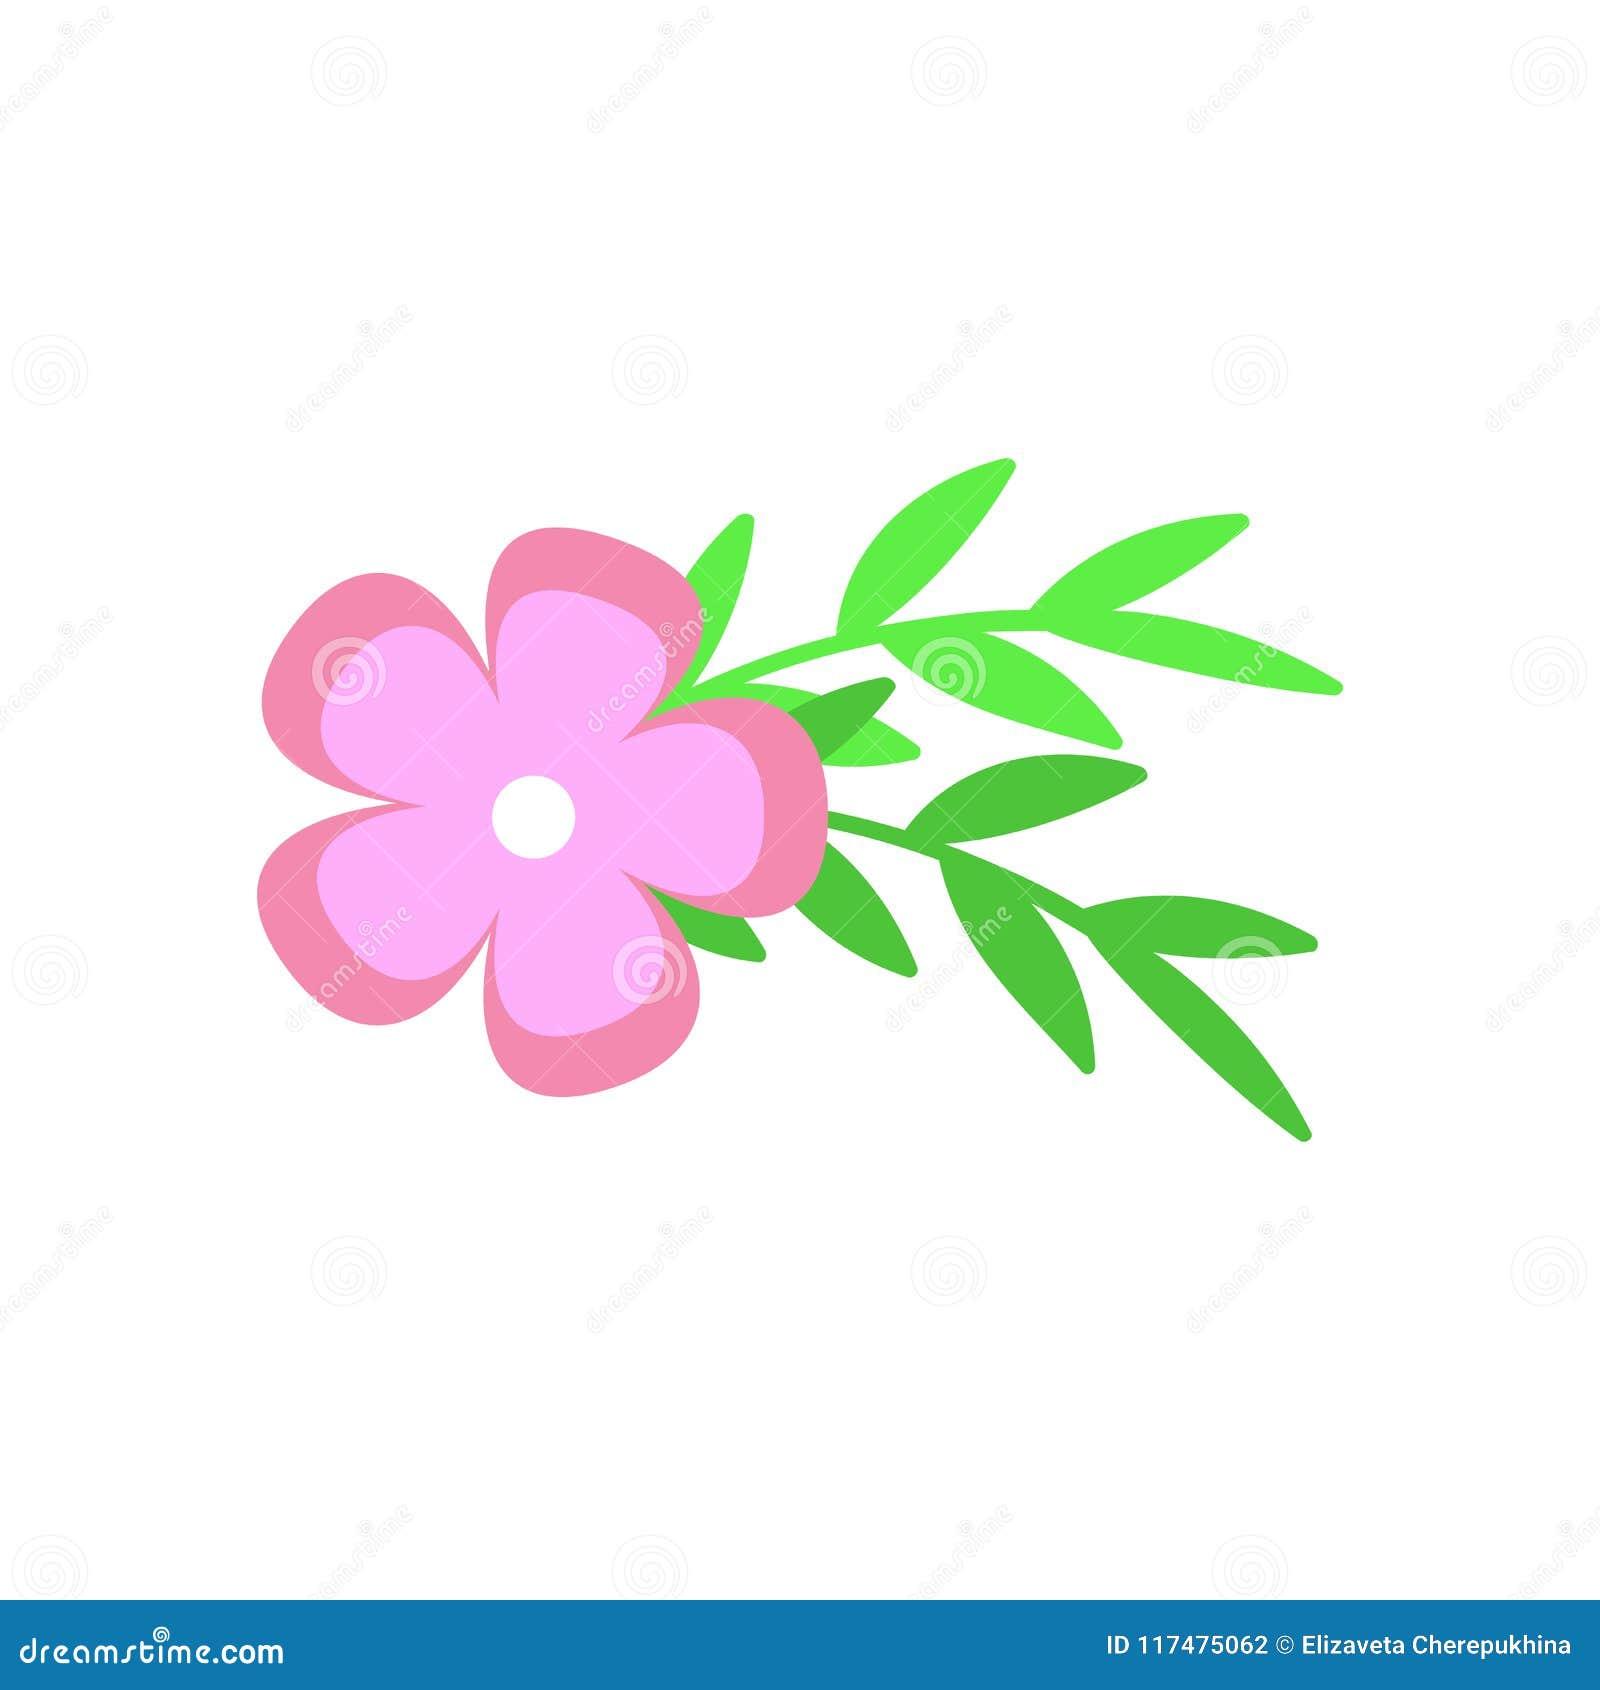 Floral διαιρέτης κειμένων Λουλούδια και φύλλα Σχέδιο ανθοδεσμών για τις γαμήλιες προσκλήσεις ή τις ευχετήριες κάρτες διάνυσμα